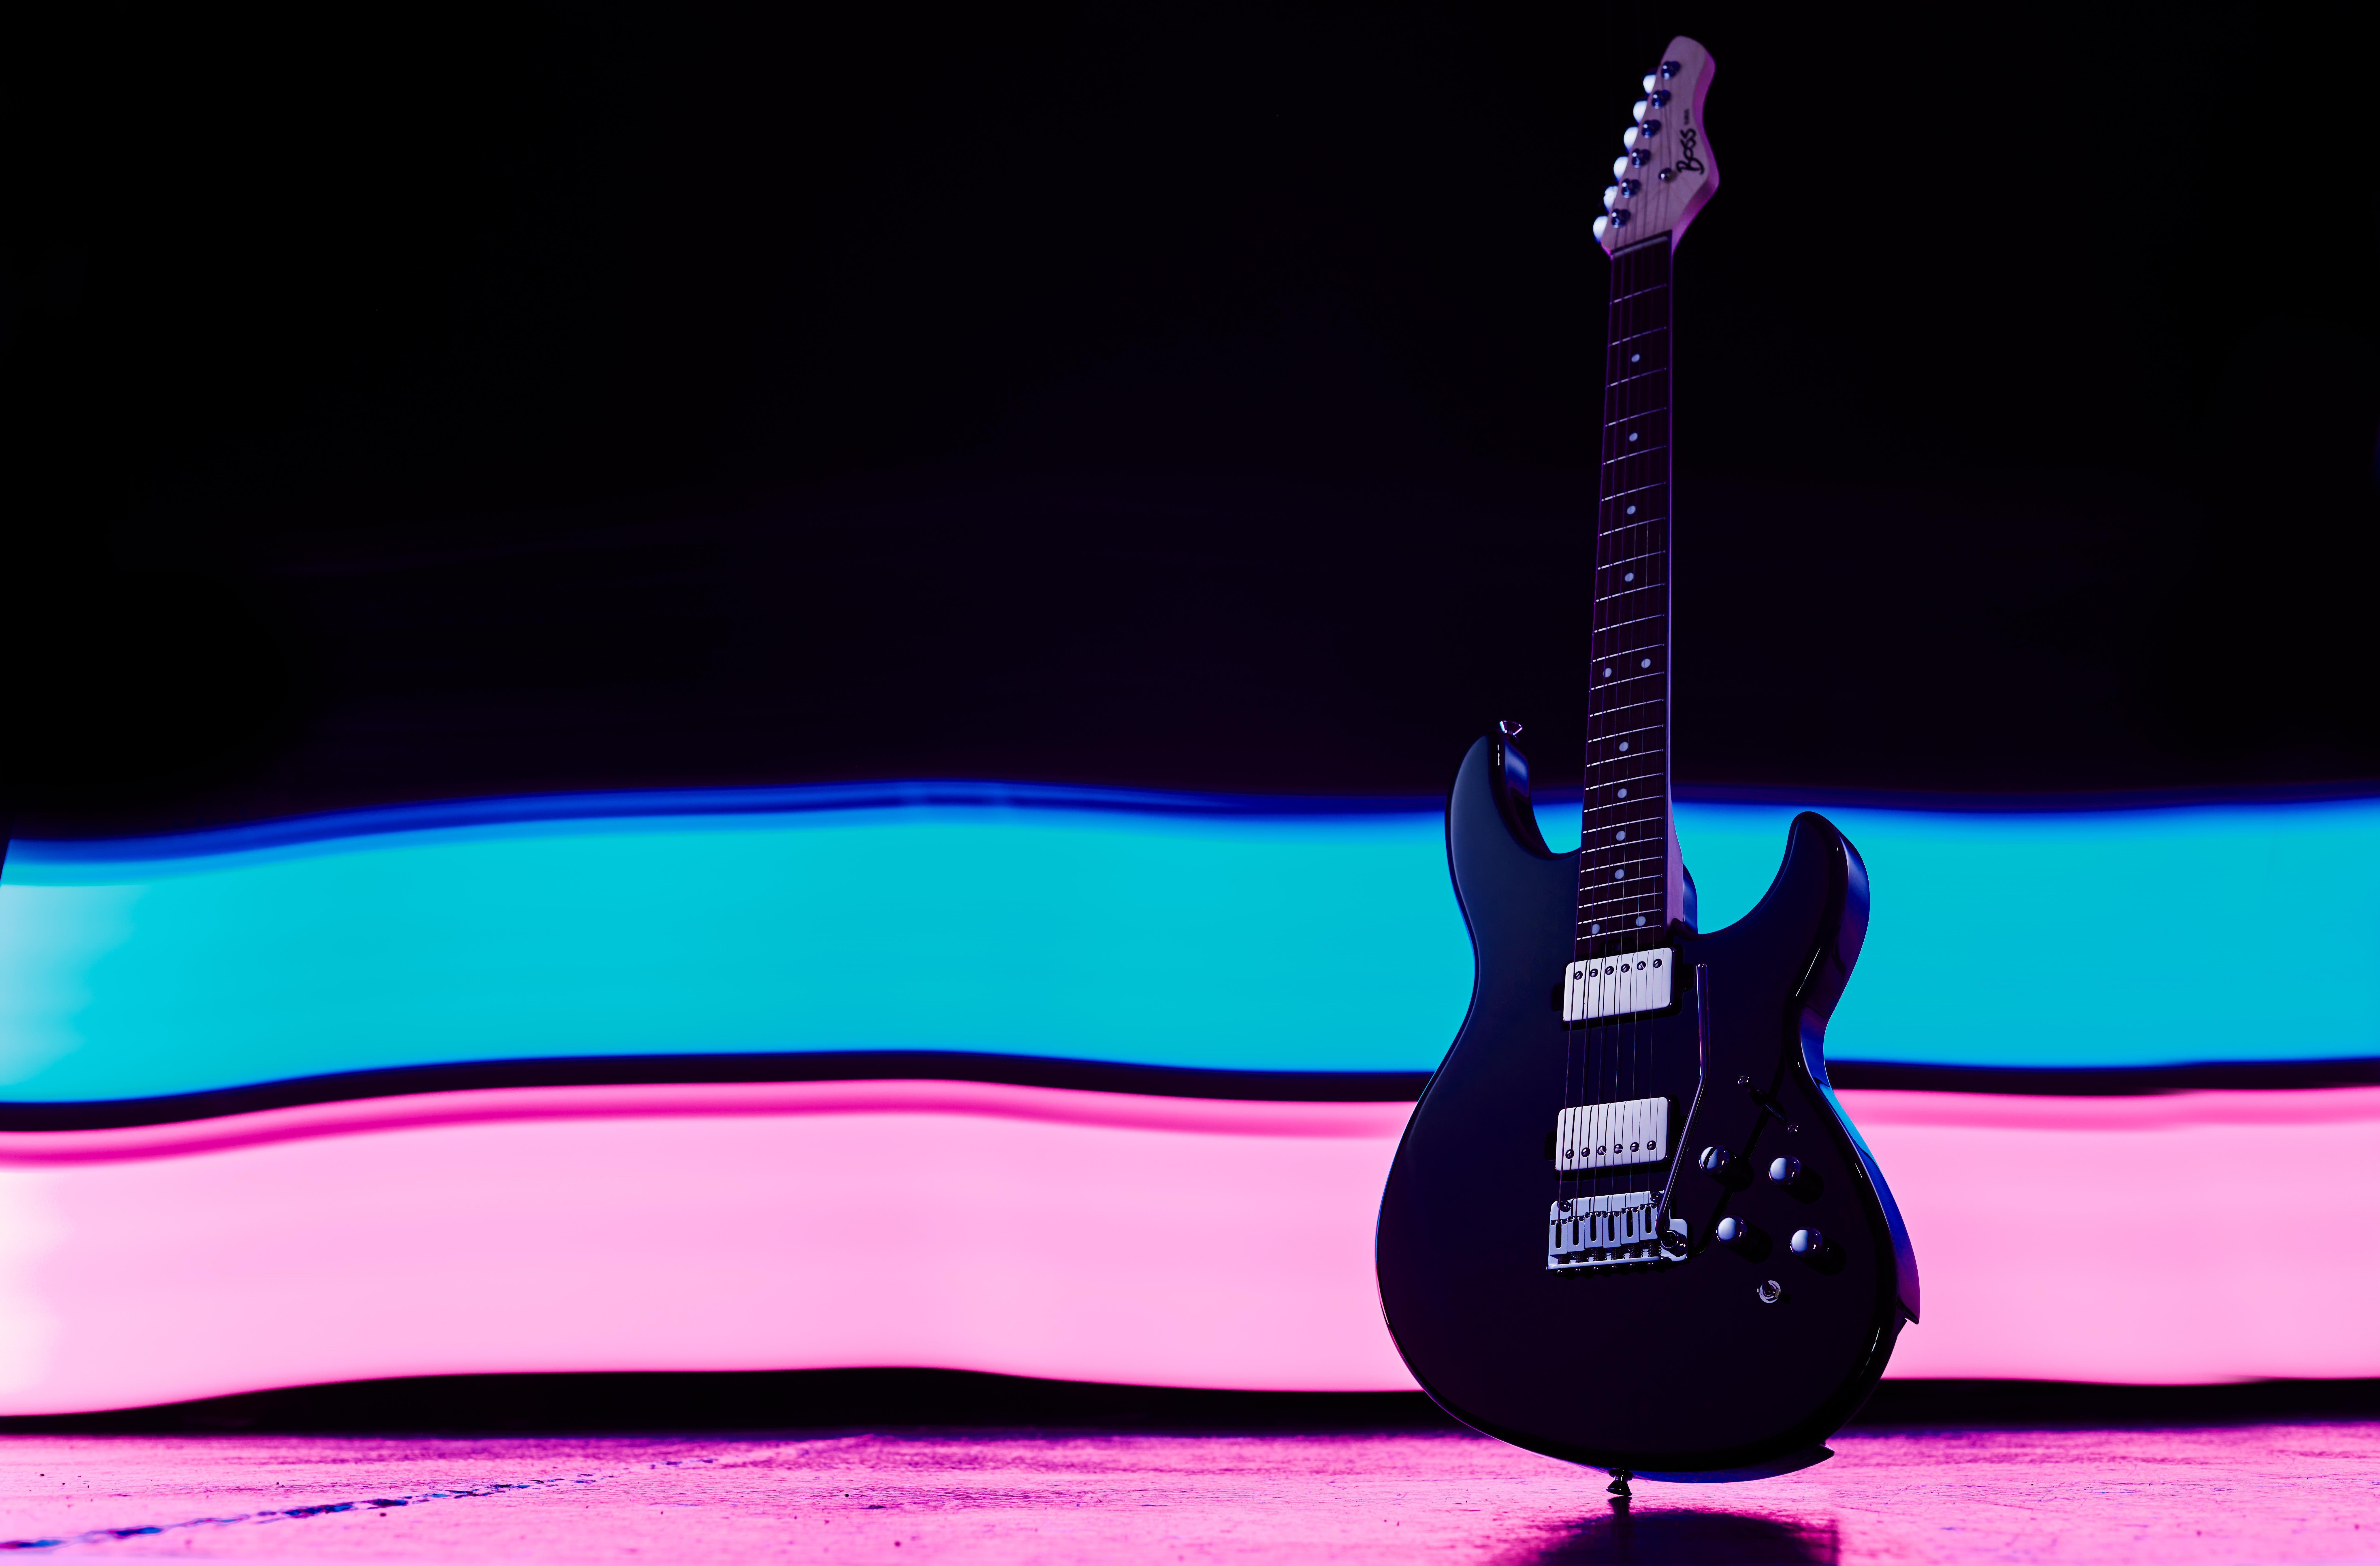 Boss Launches the EURUS GS-1 Guitar